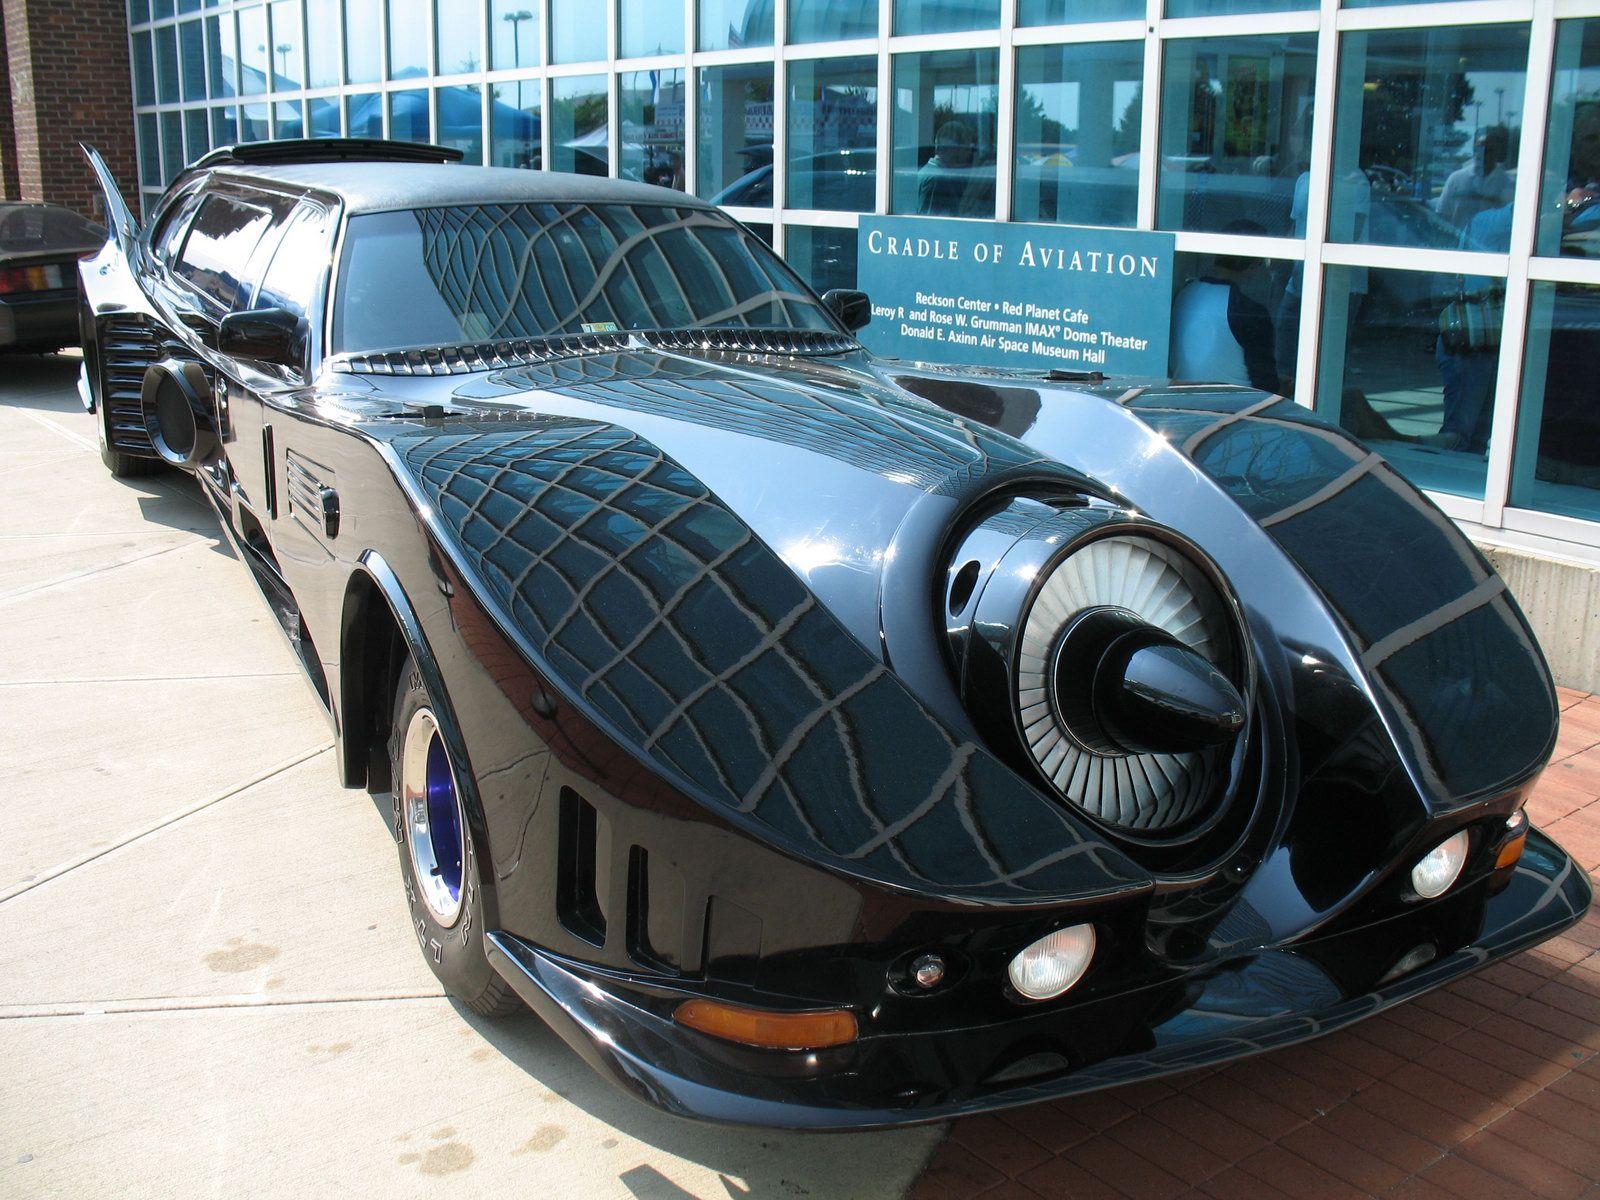 batmobile limousine stretching the superhero awesomeness